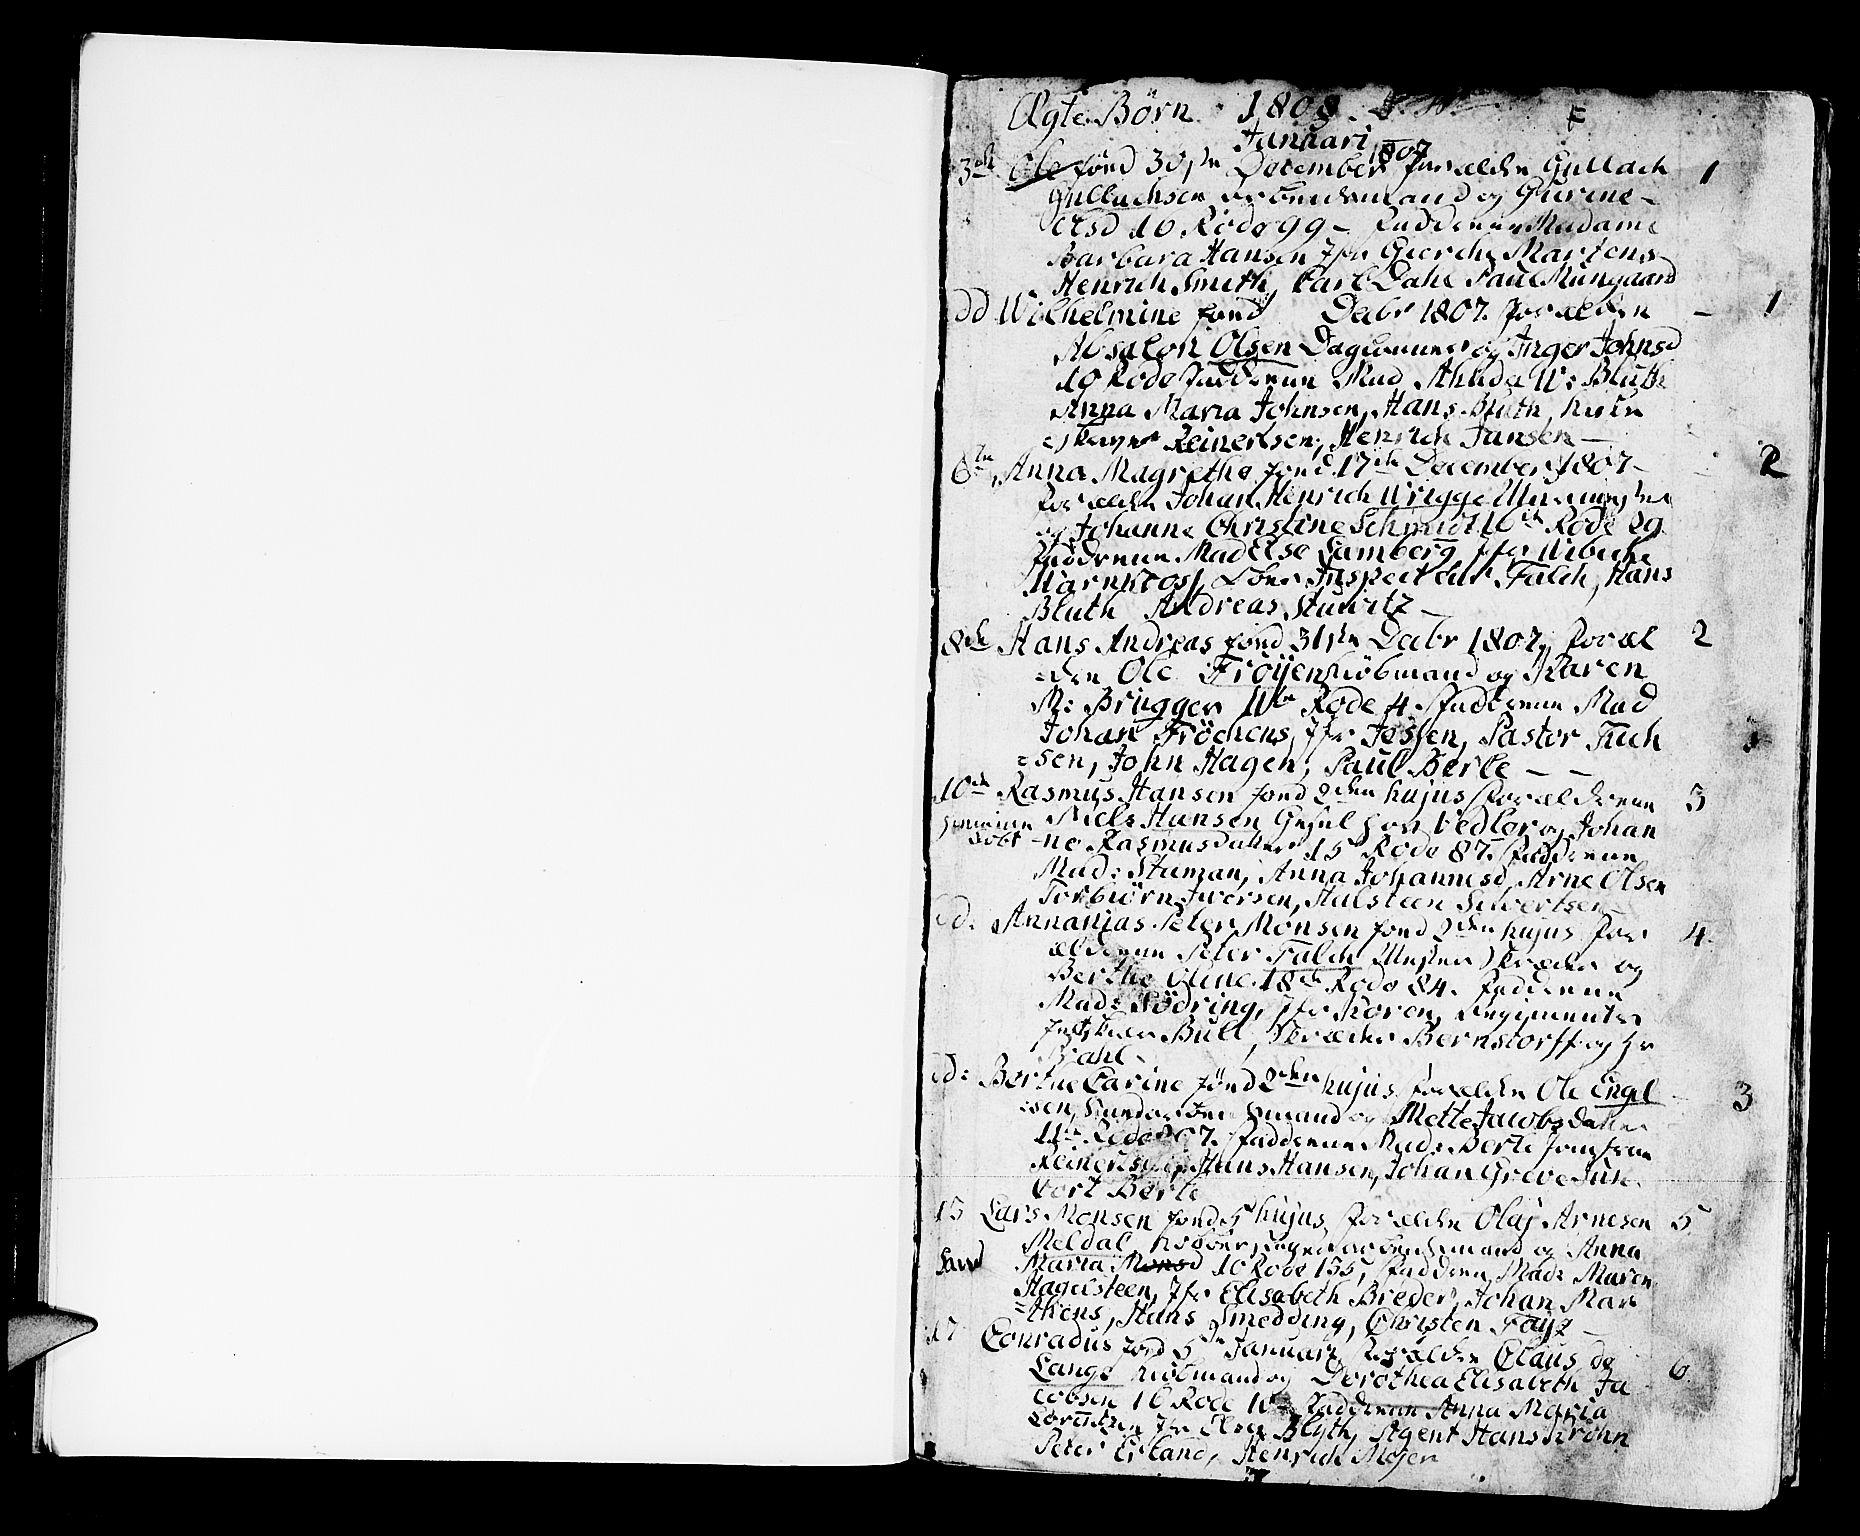 SAB, Domkirken Sokneprestembete, H/Haa/L0005: Ministerialbok nr. A 5, 1808-1820, s. 0-1